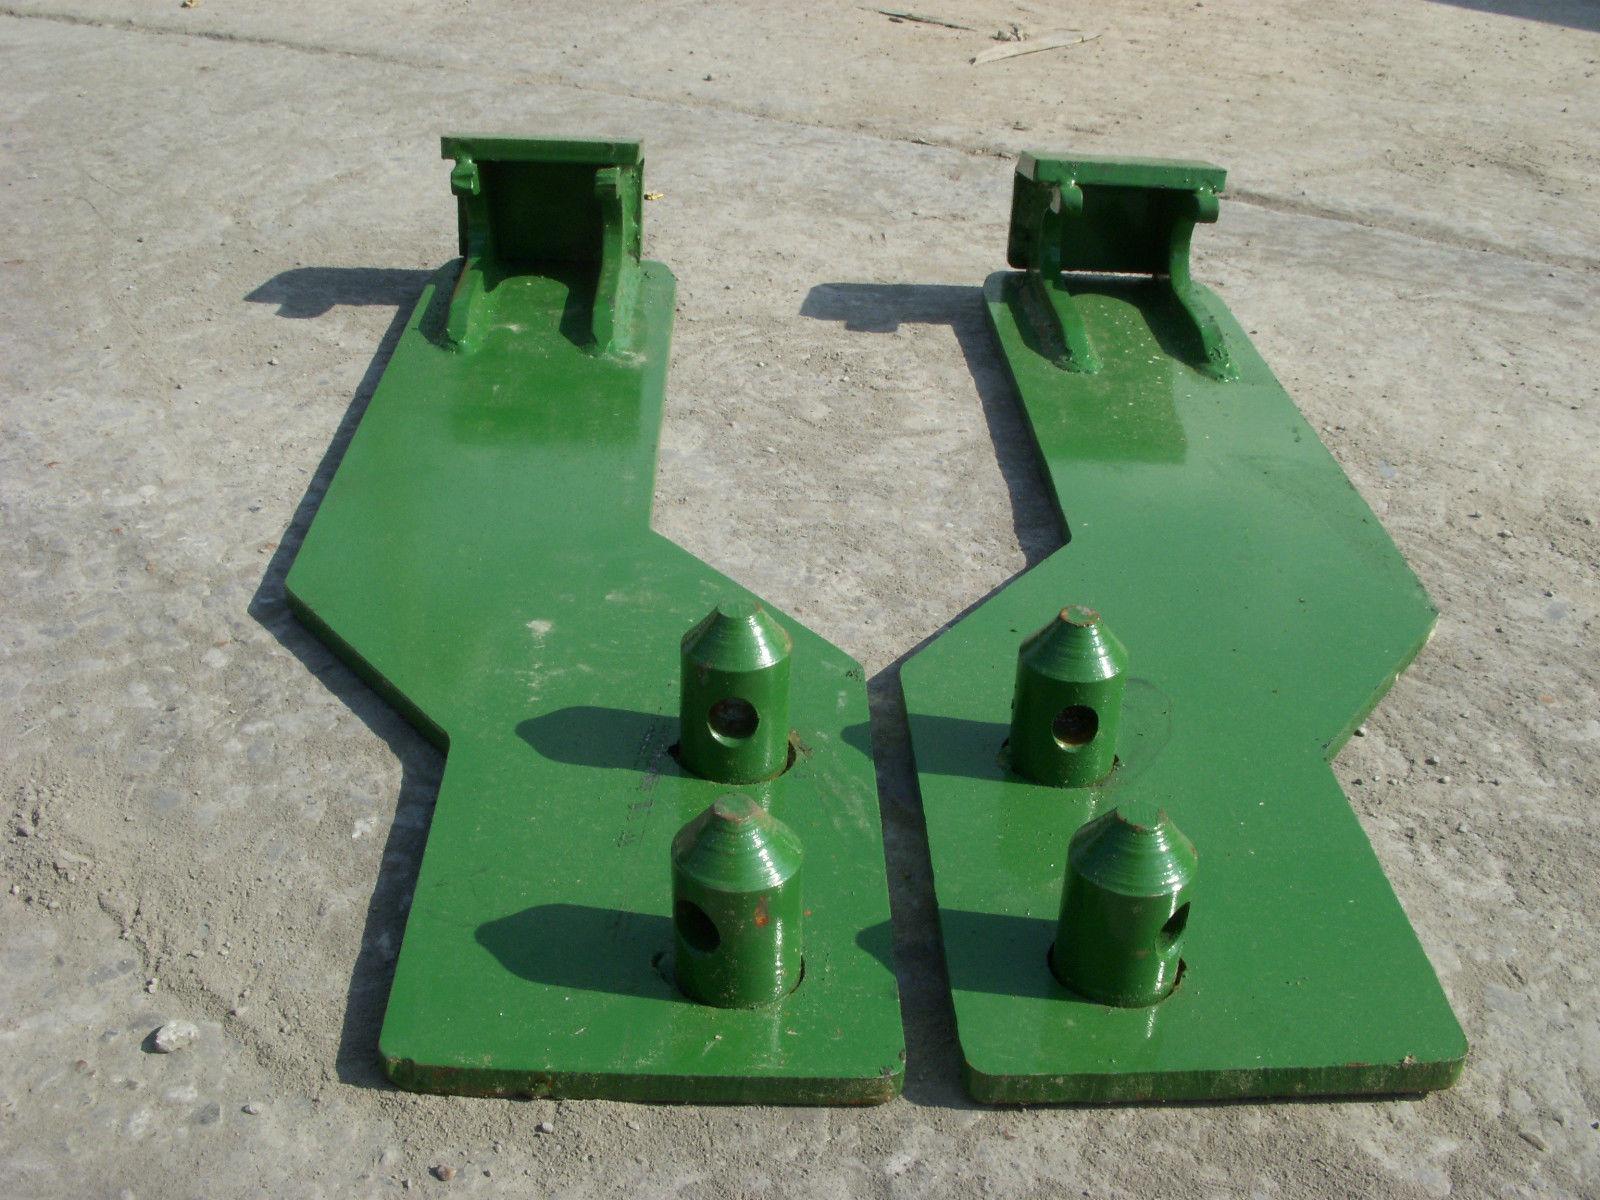 Mounting Brackets For John Deere Tractor Loader - Skid ...